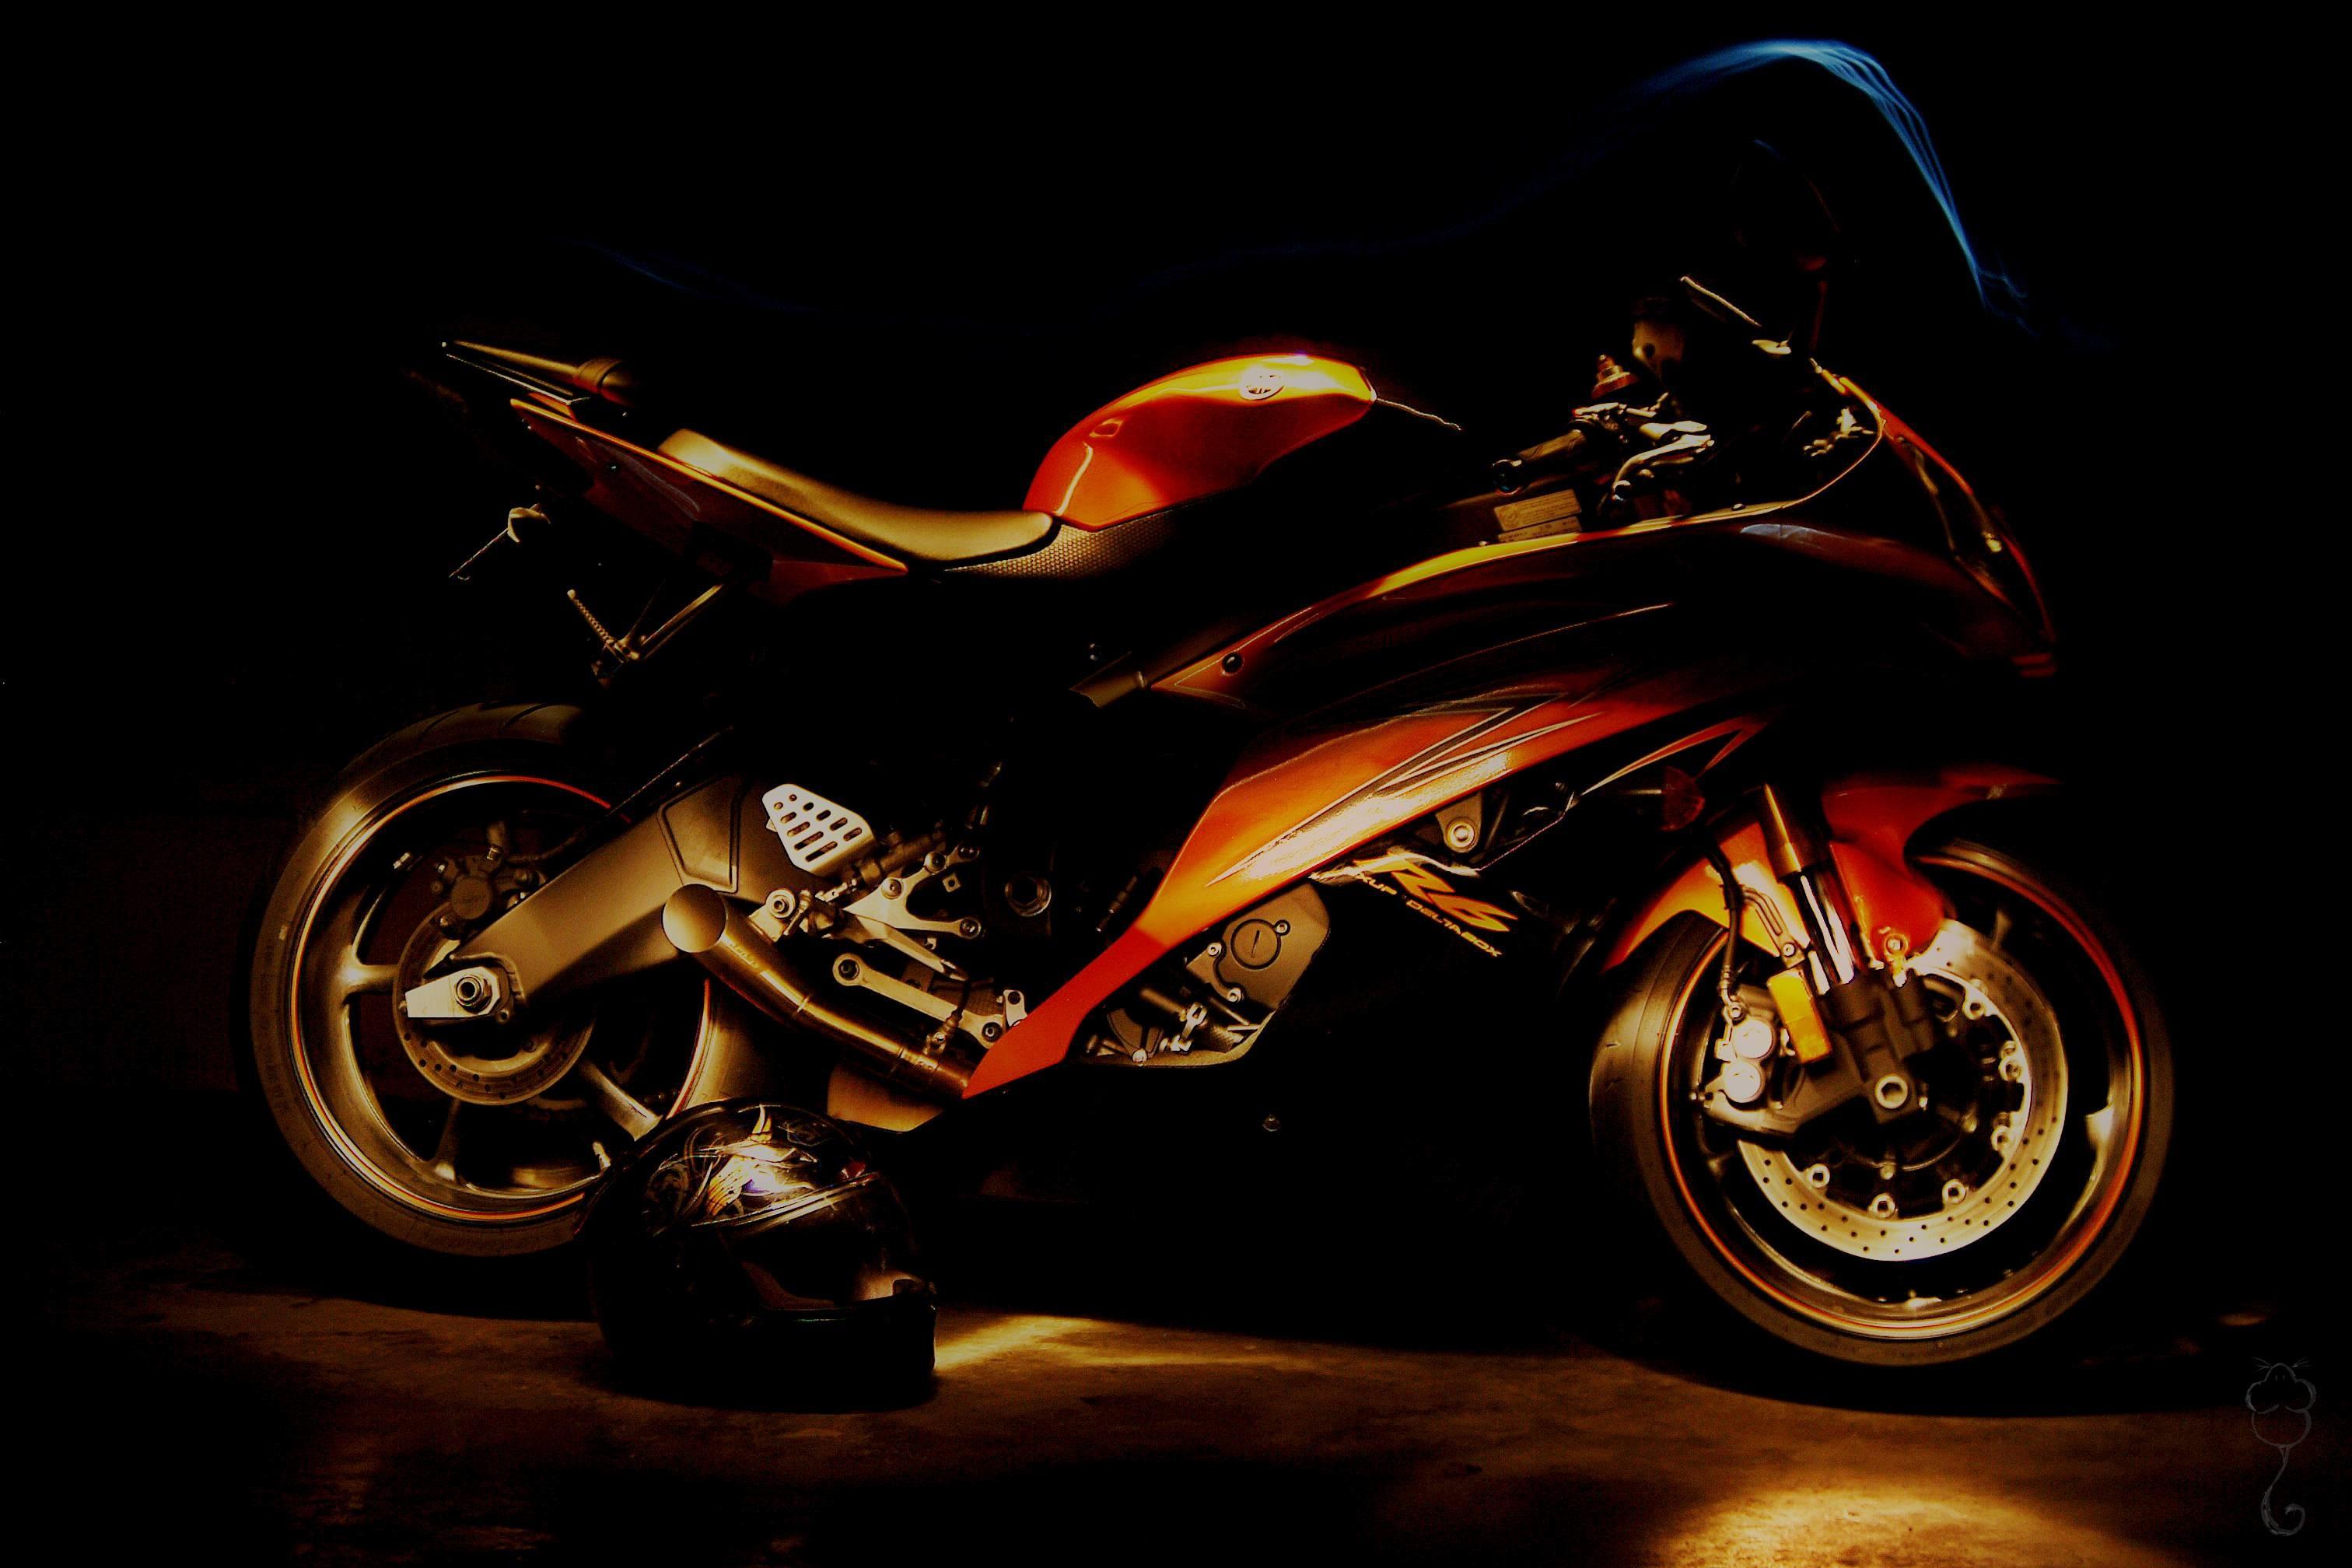 Motorbike Wallpaper (62+ Pictures